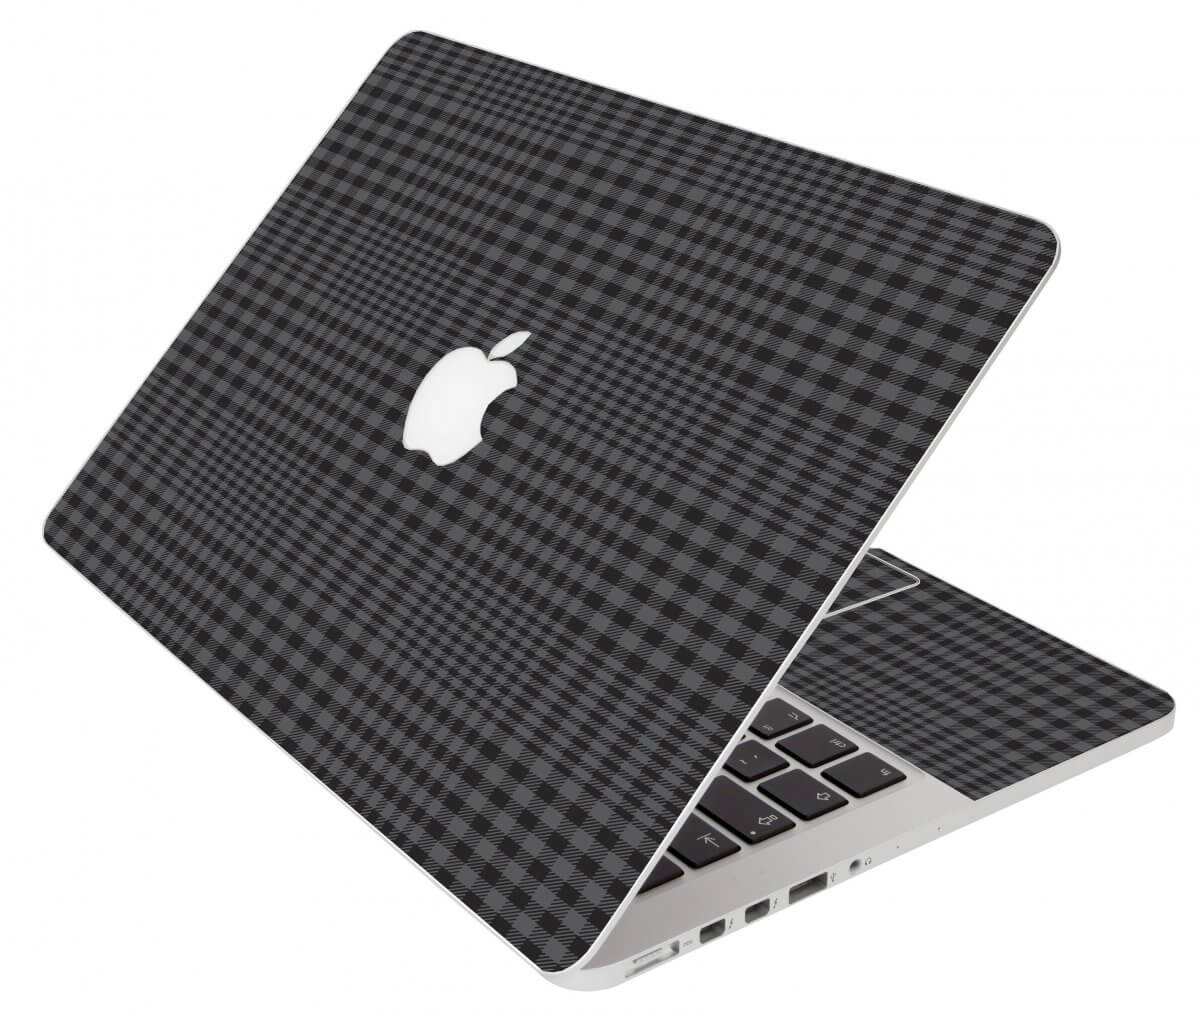 Black Plaid Apple Macbook Original 13 A1181 Laptop Skin